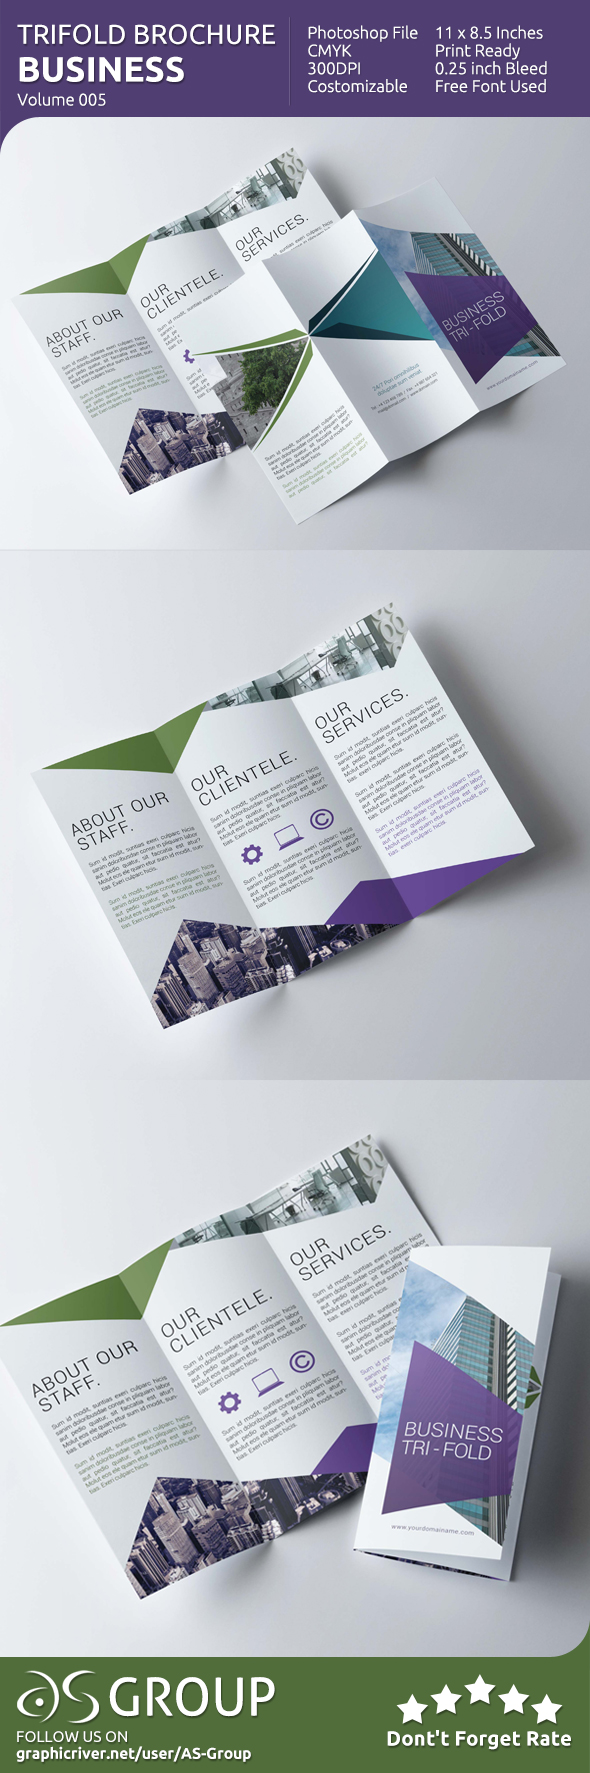 business_tri-fold-brochure-v005-preview